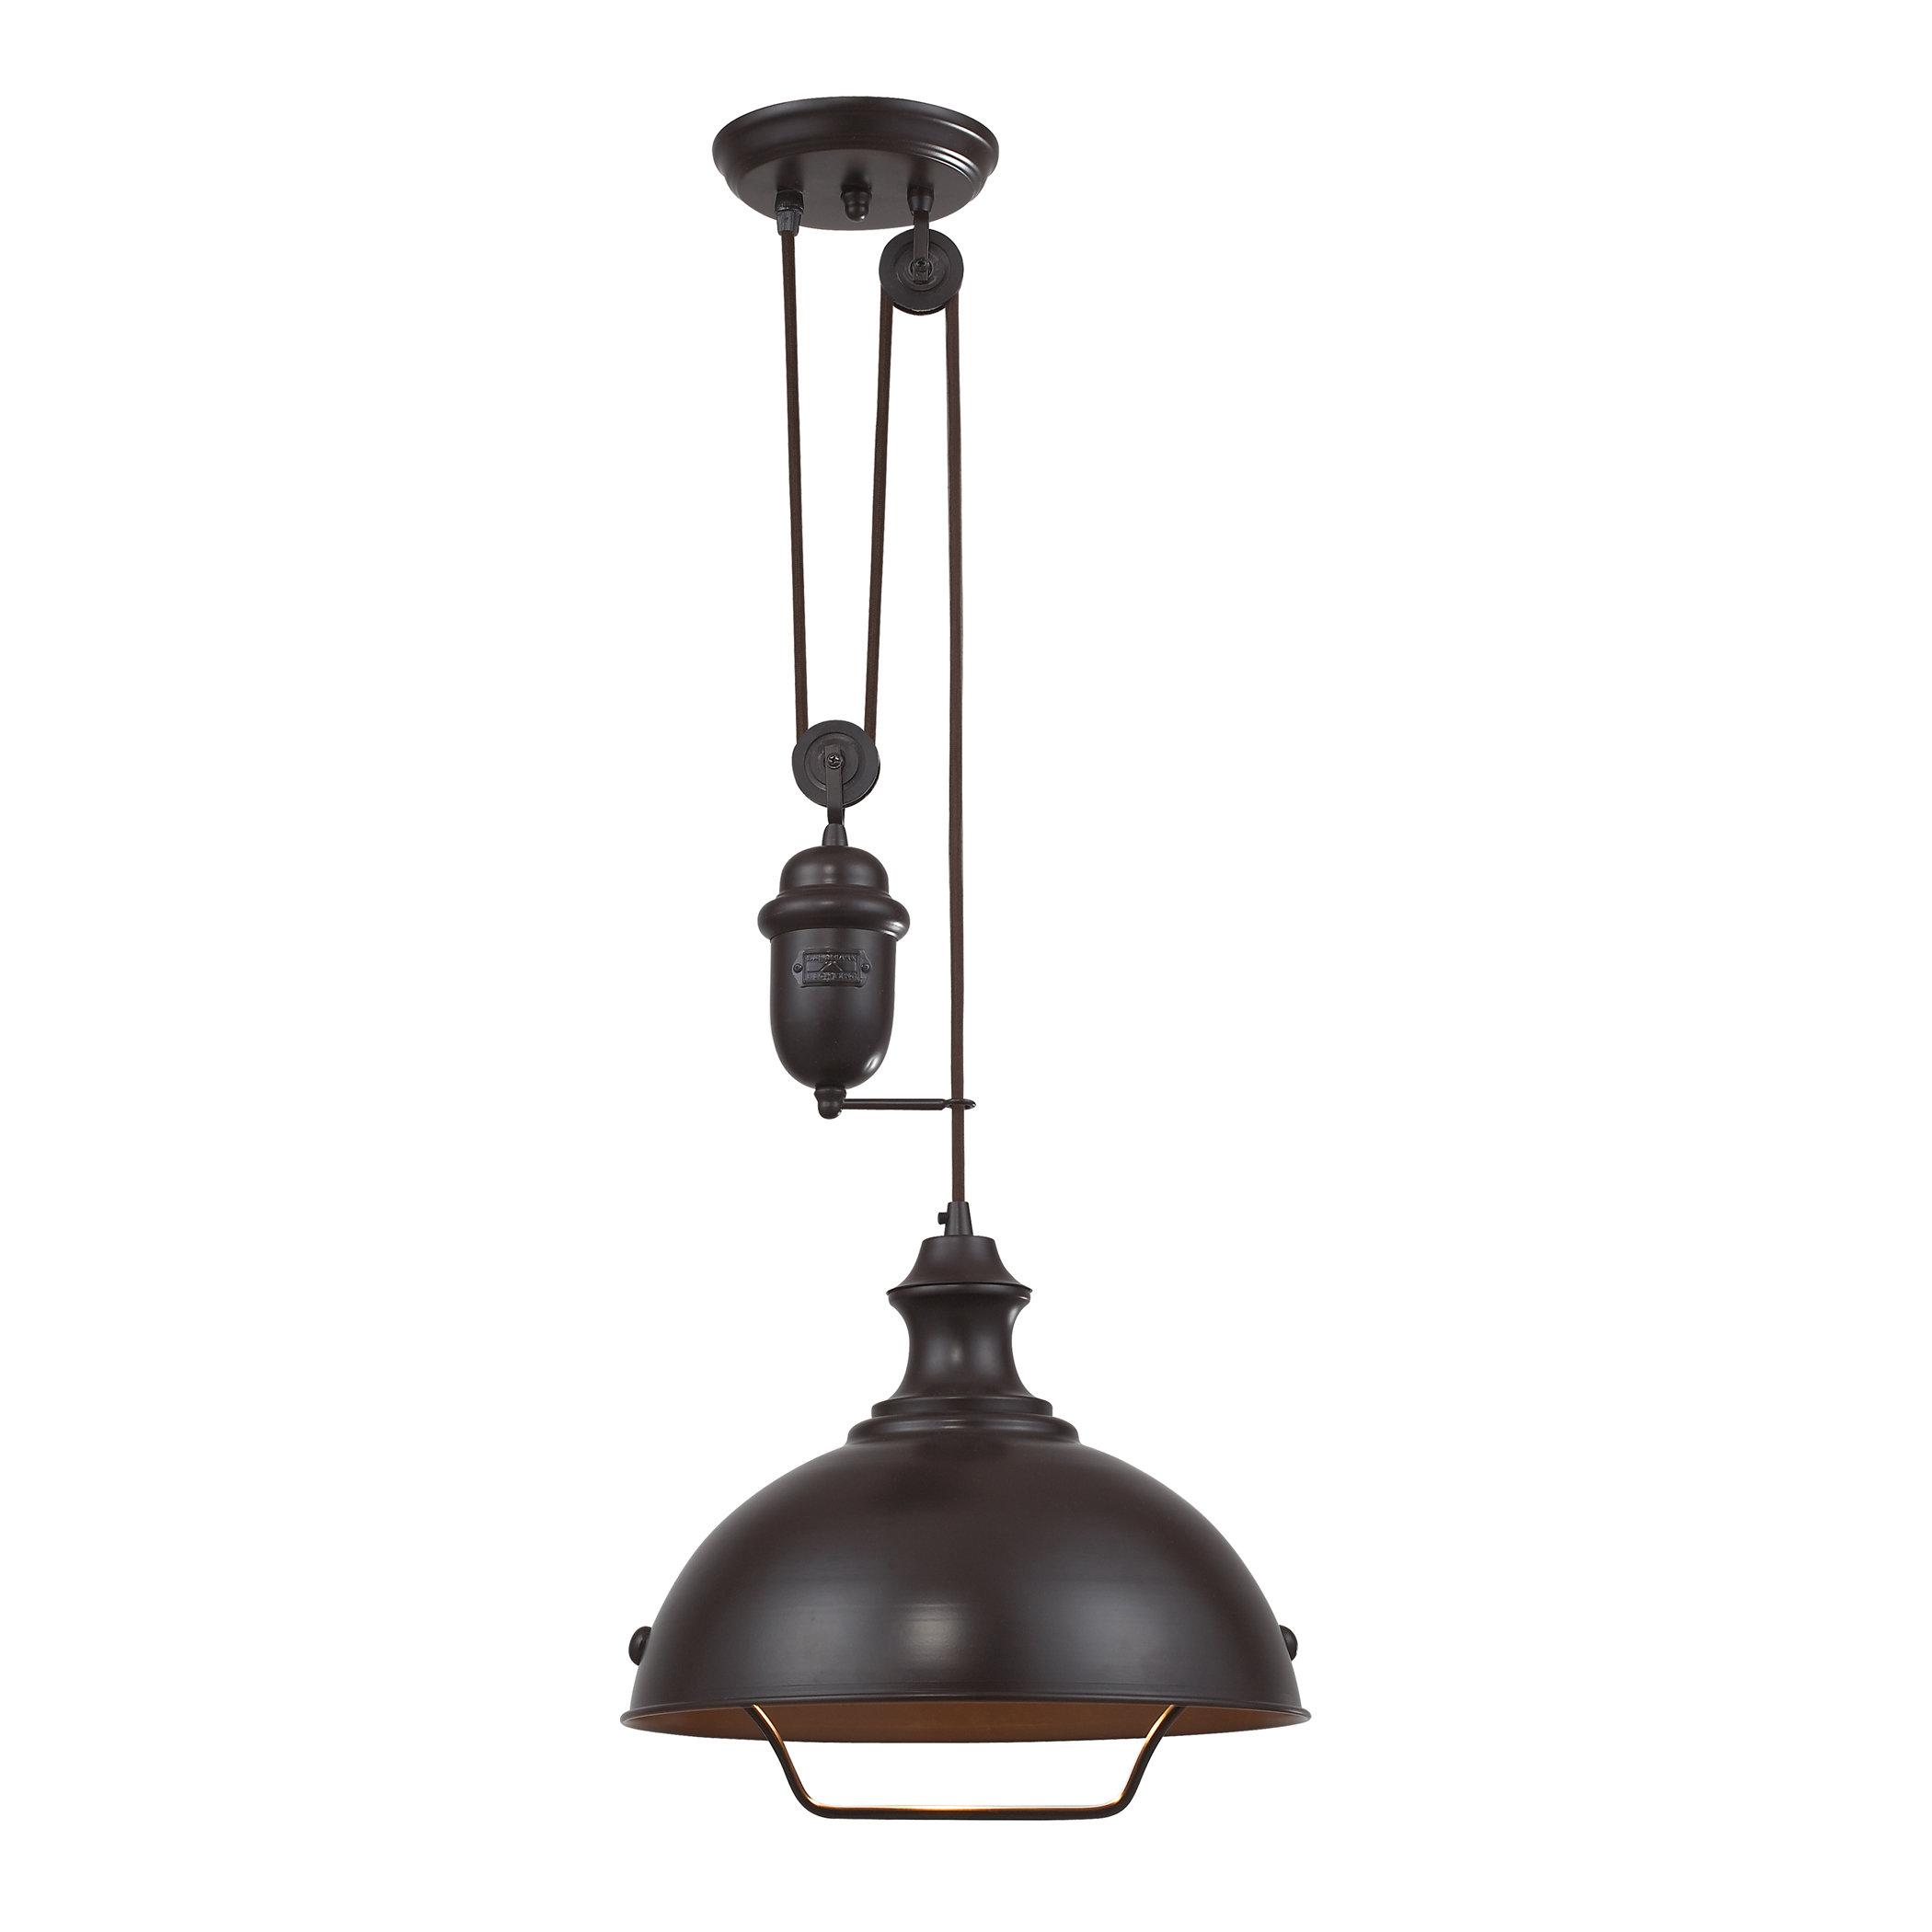 Legrand 1 Light Single Dome Pendant & Reviews | Joss & Main Within Ariel 2 Light Kitchen Island Dome Pendants (Image 23 of 30)